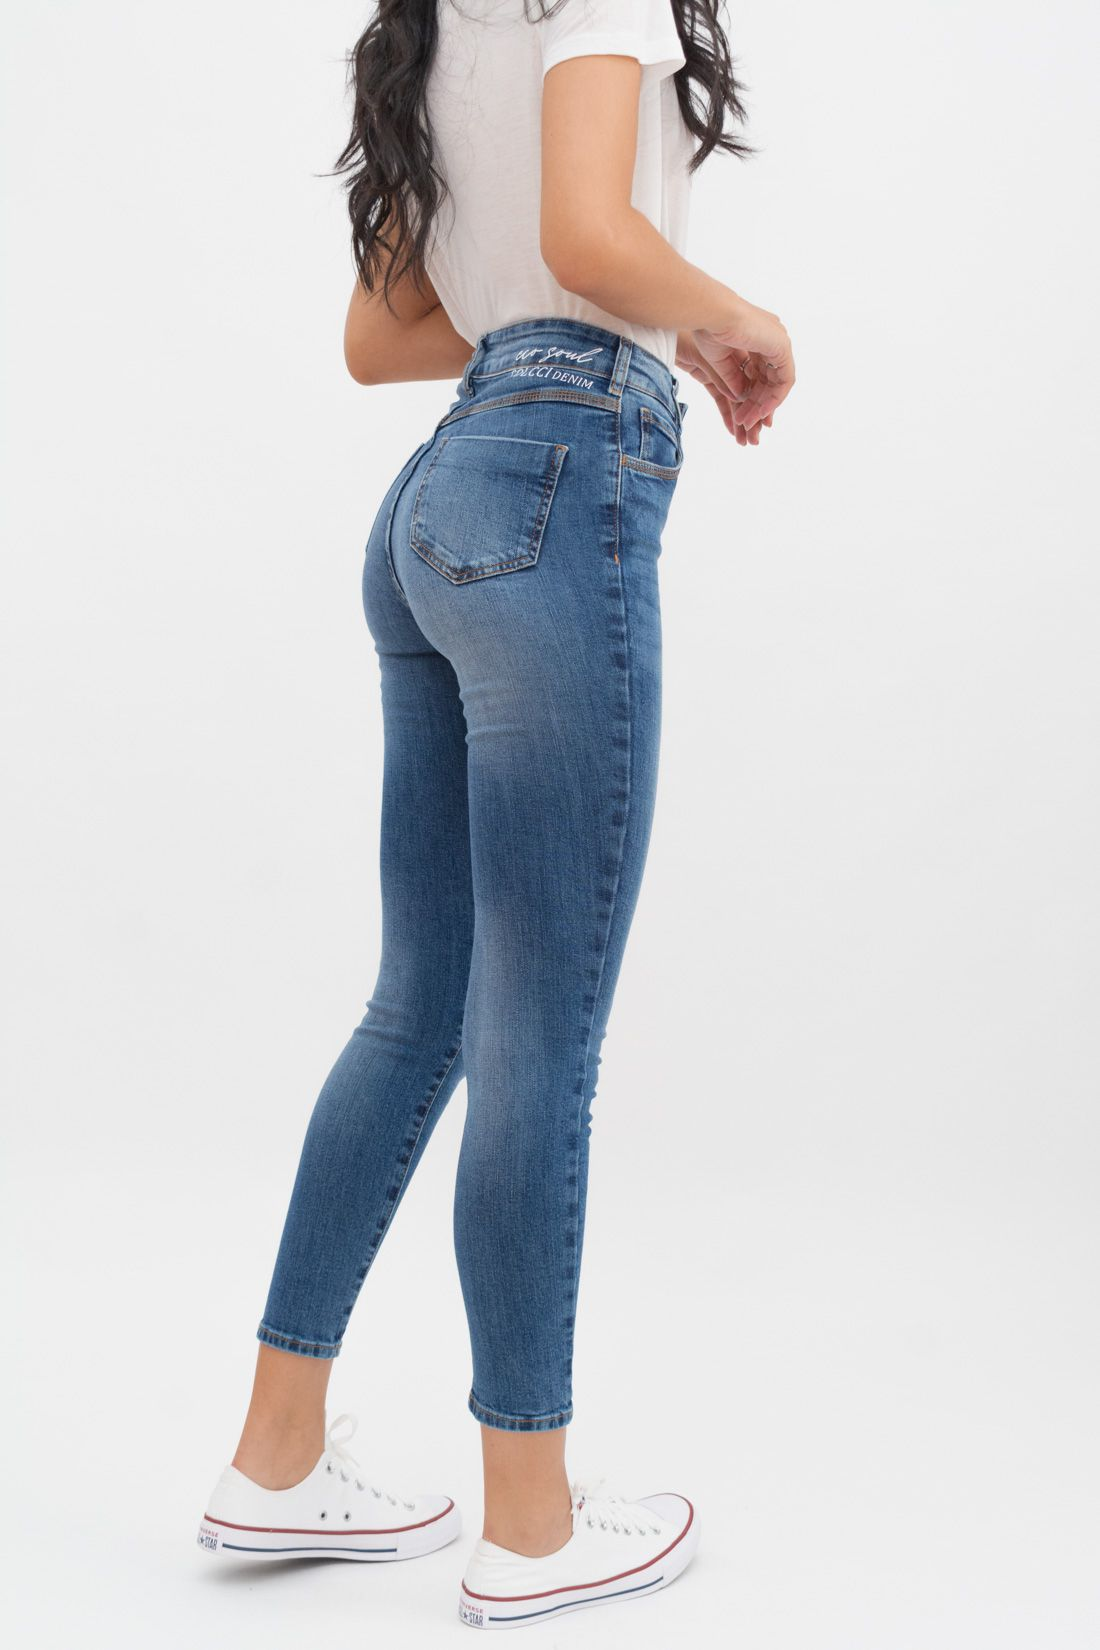 Calca Jeans Colcci Eco Soul